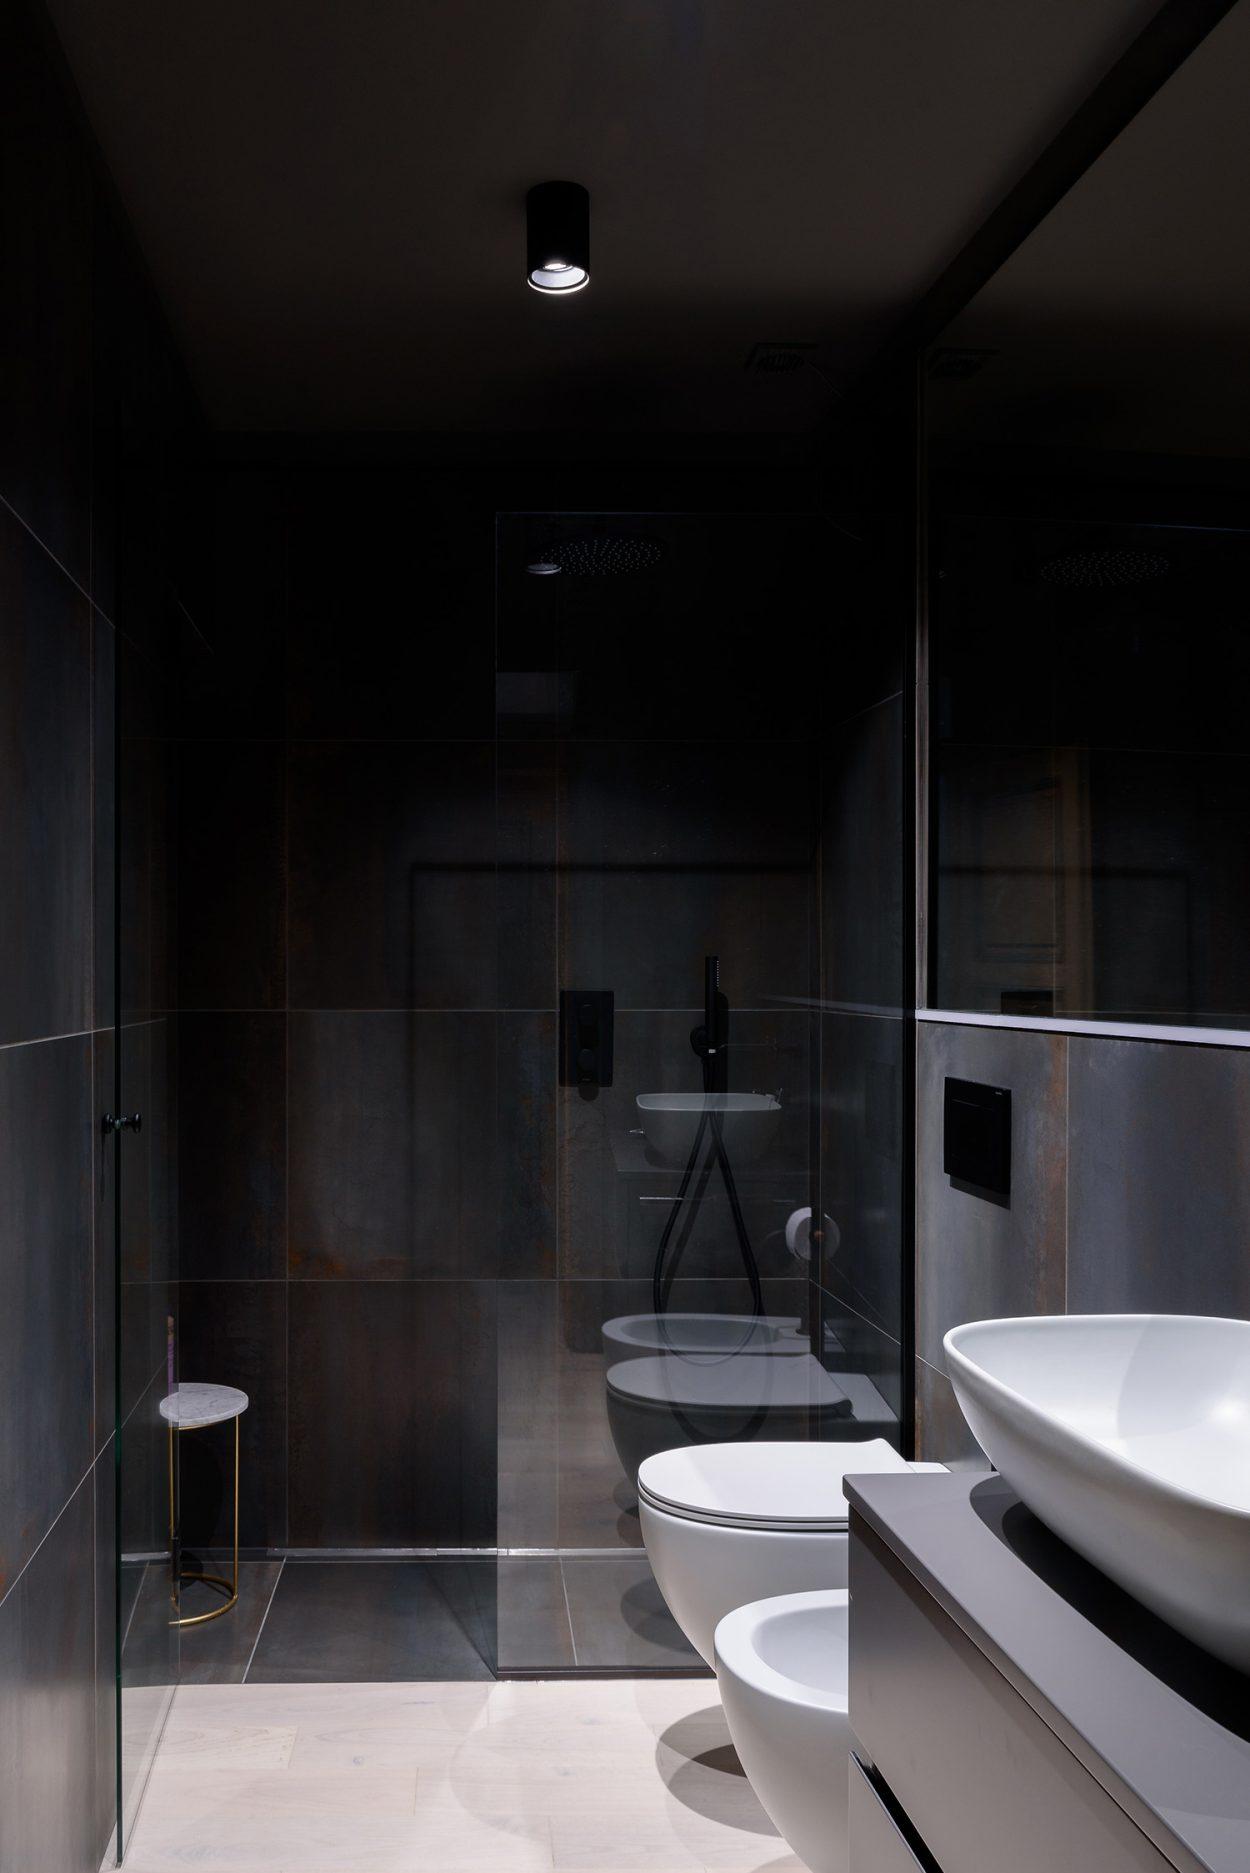 12-Ristrutturazione-Appartamento-Cesena-di-qualità-1250x1873.jpg